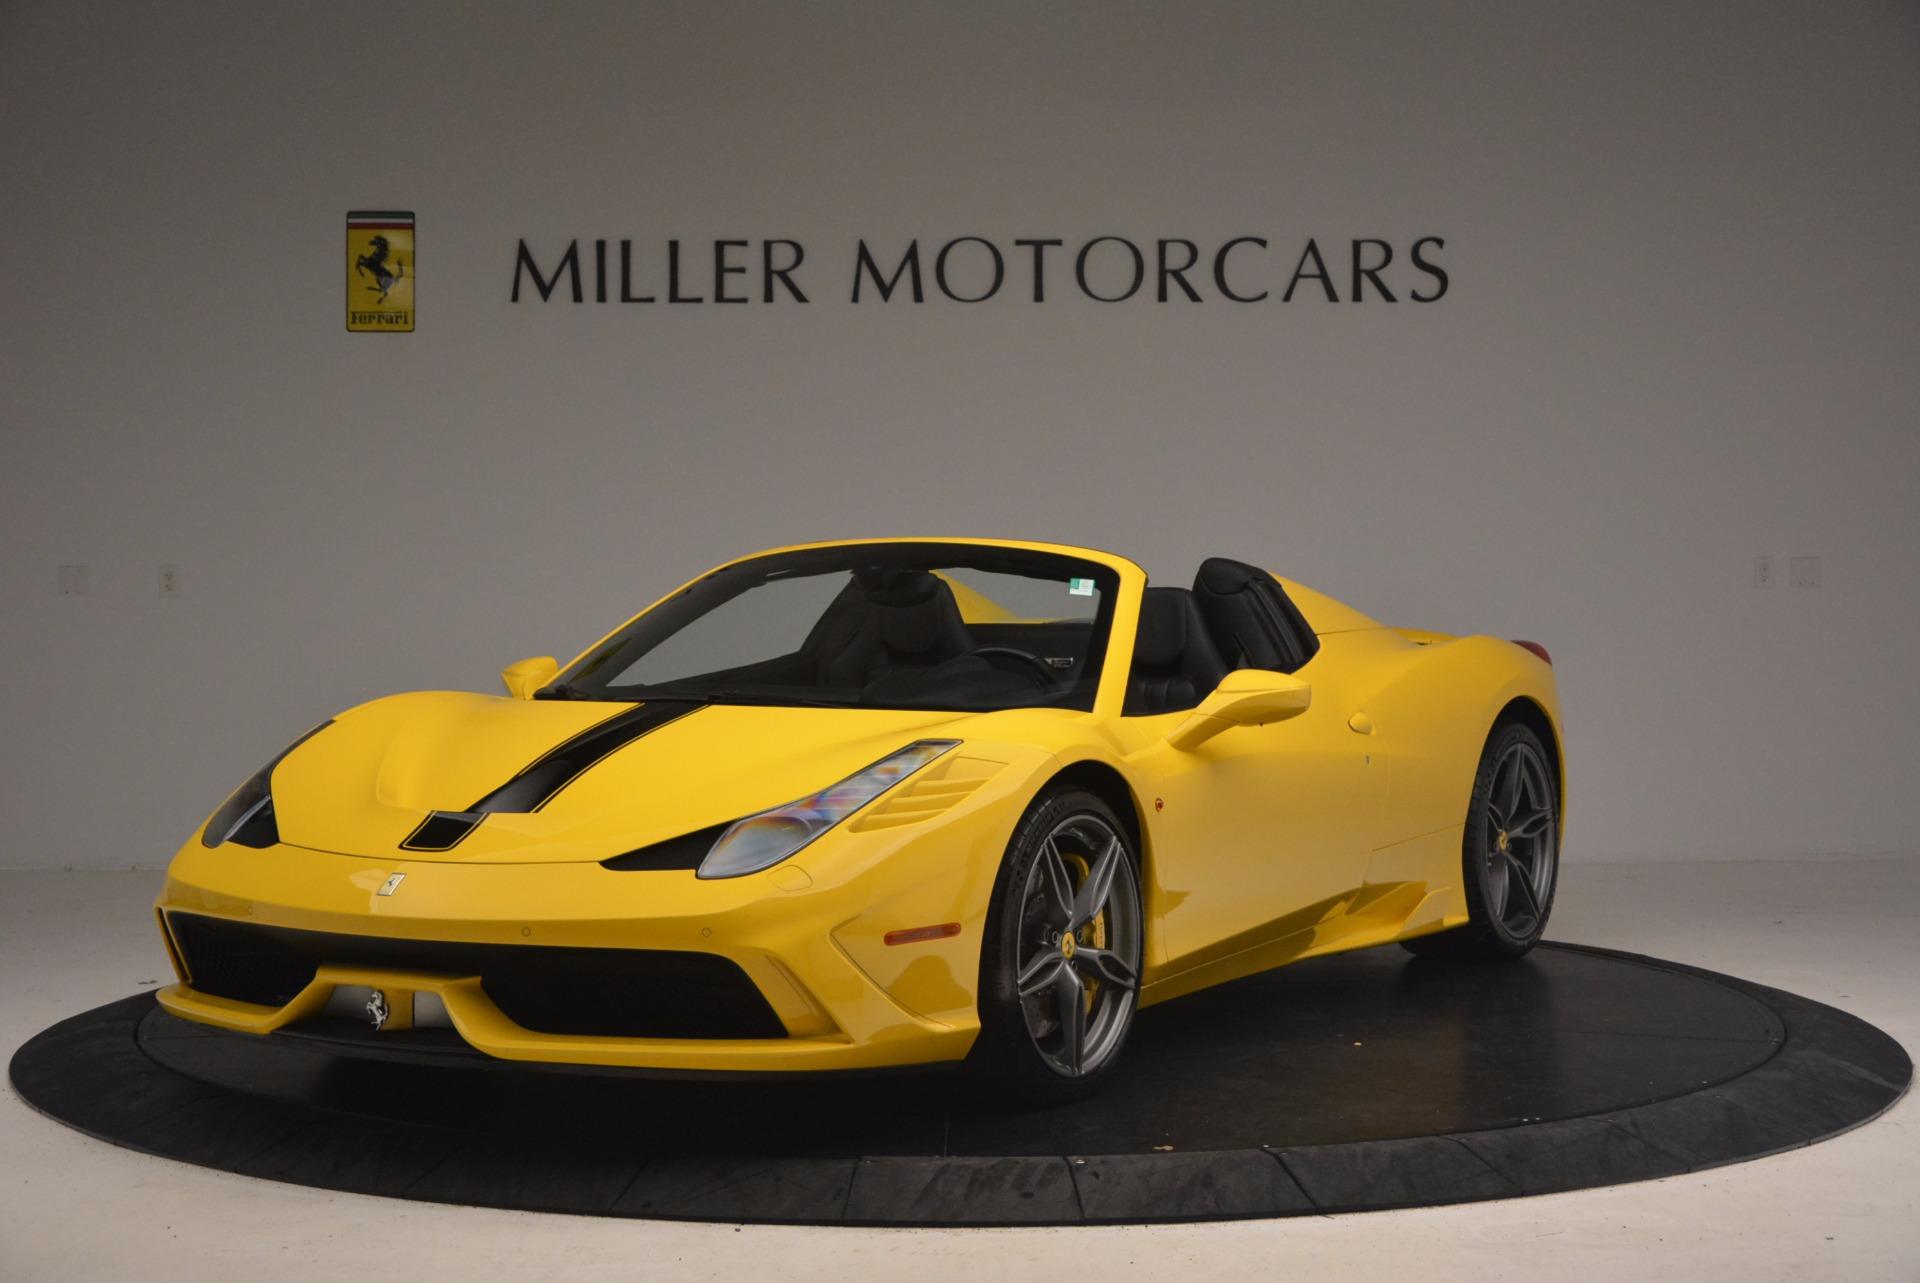 Used 2015 Ferrari 458 Speciale Aperta for sale Sold at McLaren Greenwich in Greenwich CT 06830 1